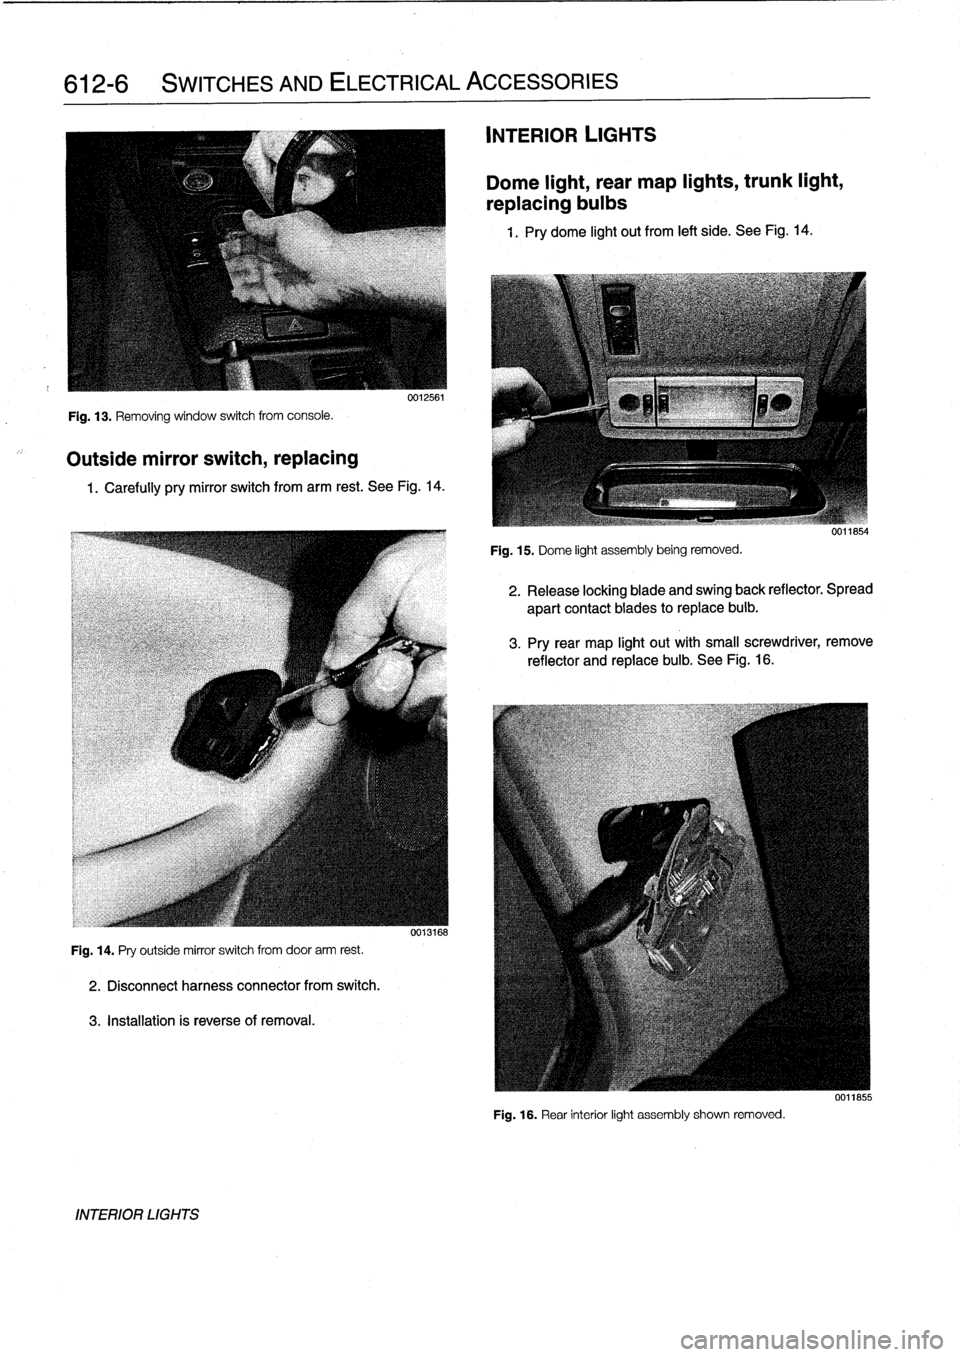 Bmw 325i 1992 E36 Workshop Manual 1983 E23 733i Car Electrical Wiring Diagram